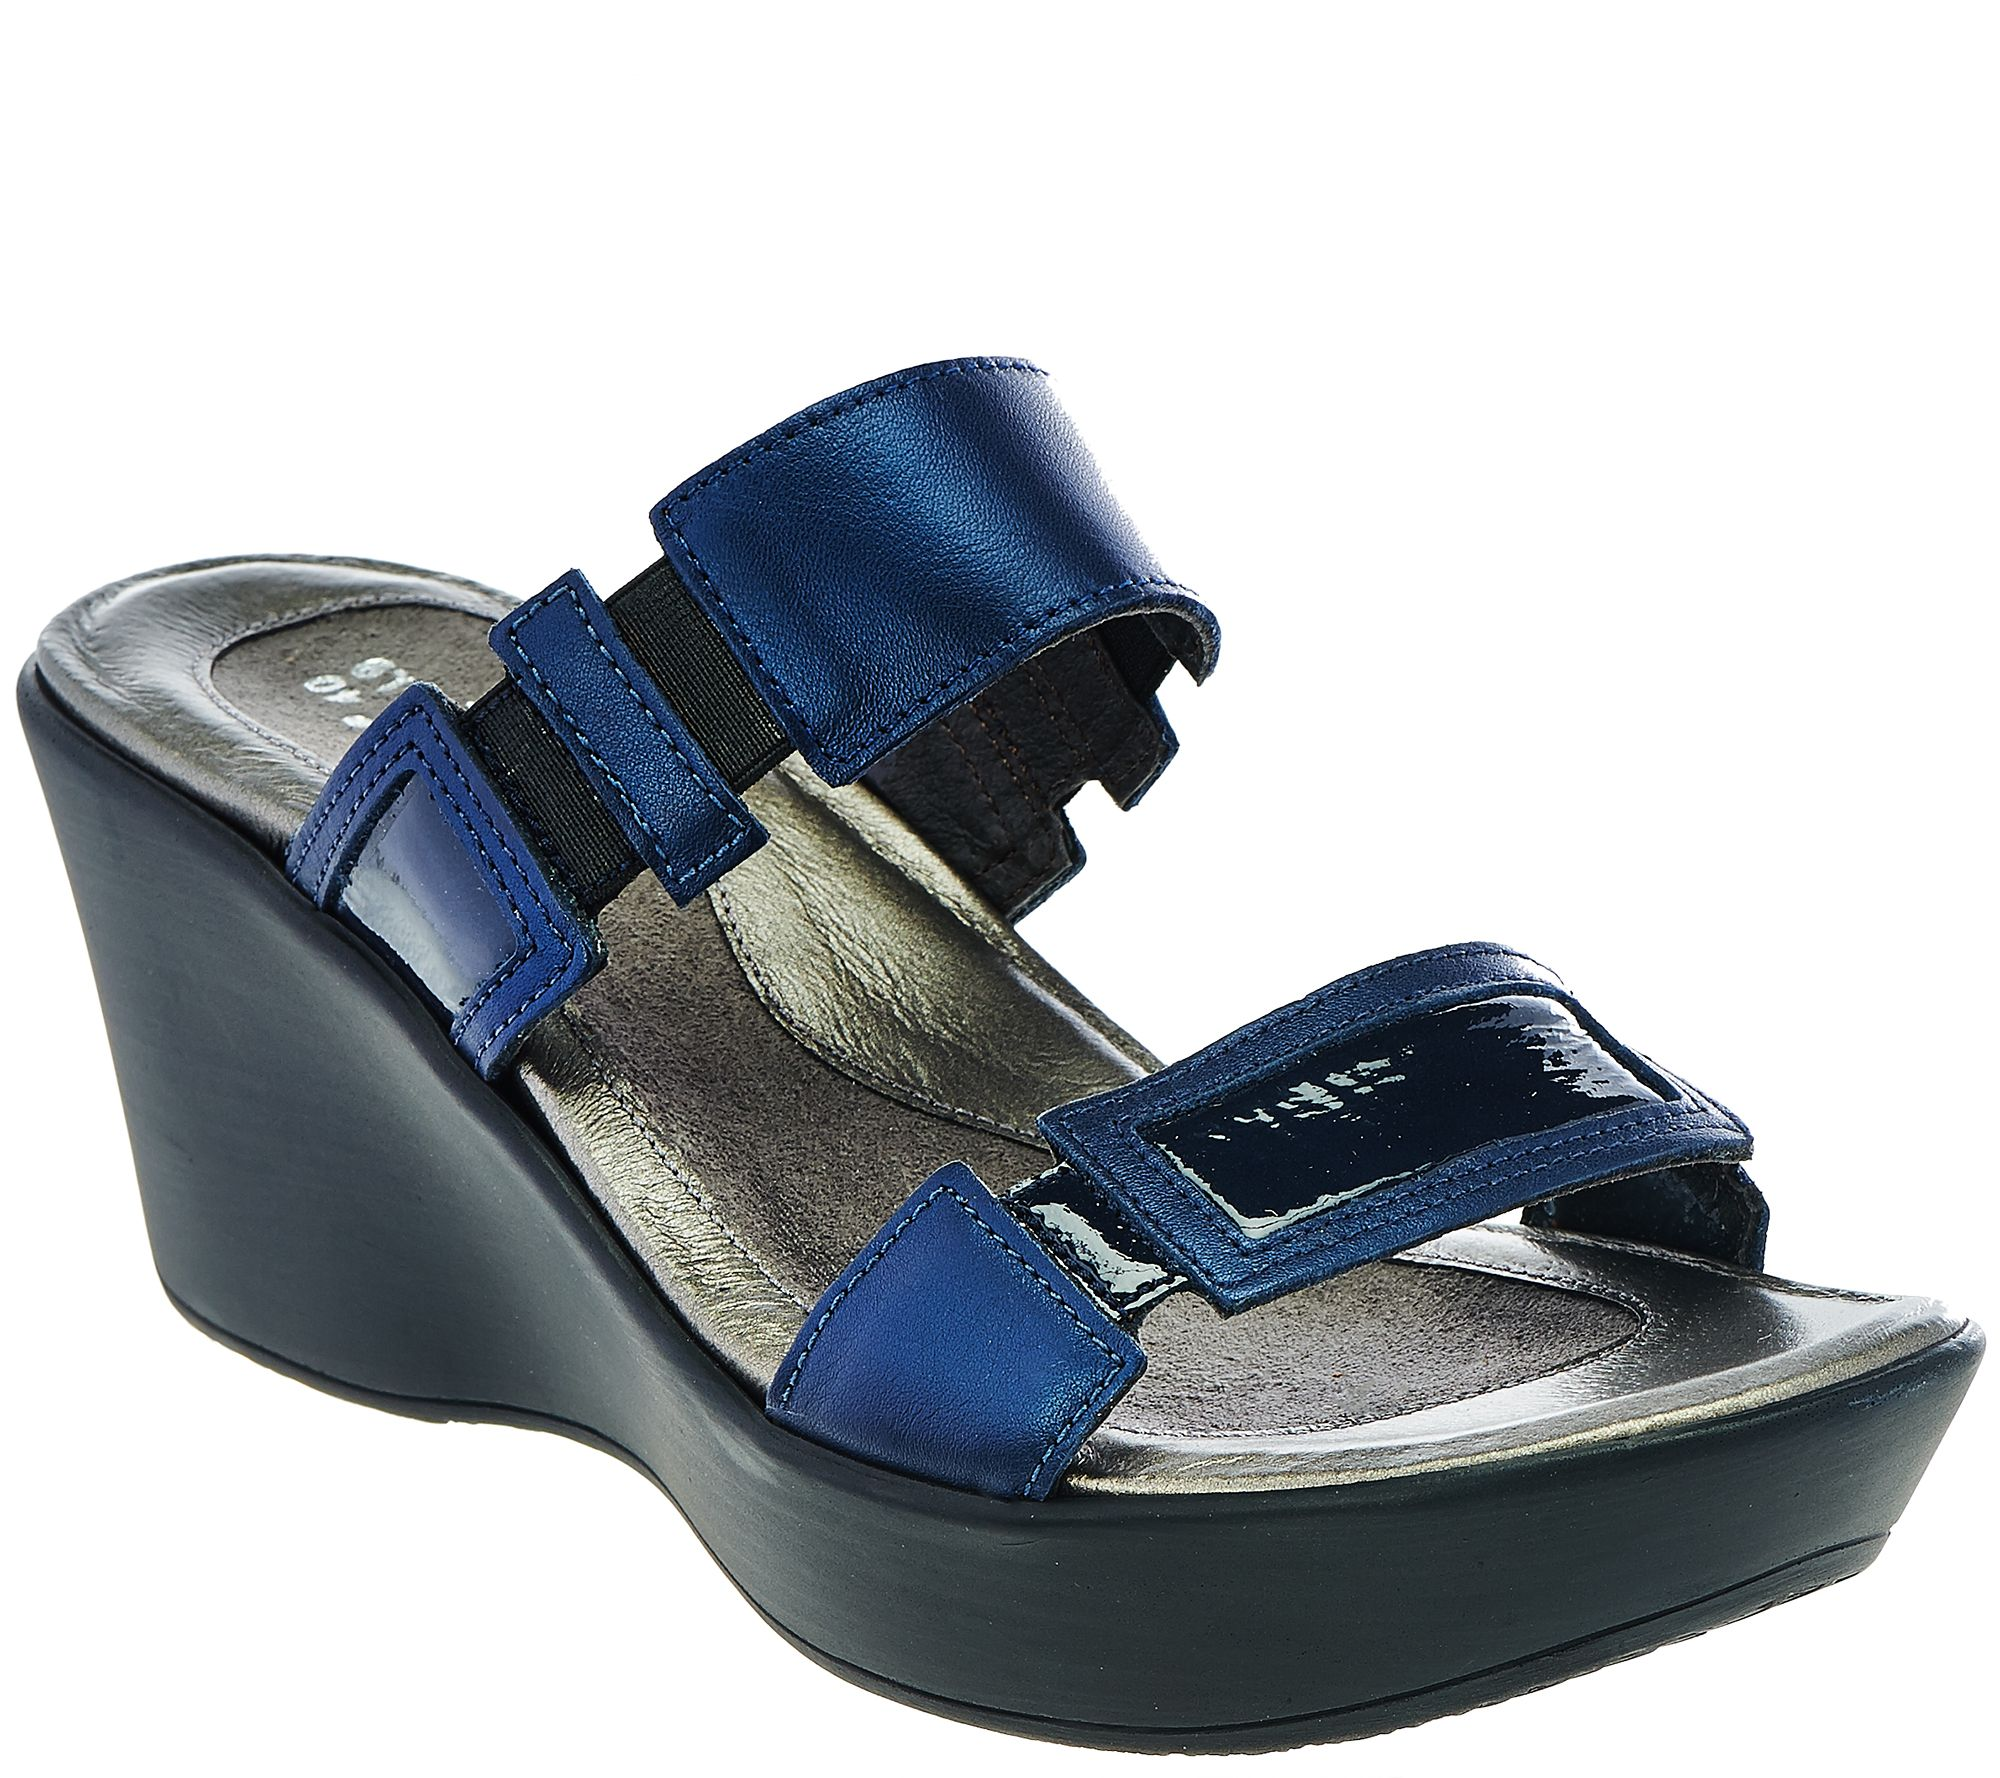 da8f9889c Naot Leather Double Strap Wedge Sandals - Treasure - Page 1 — QVC.com